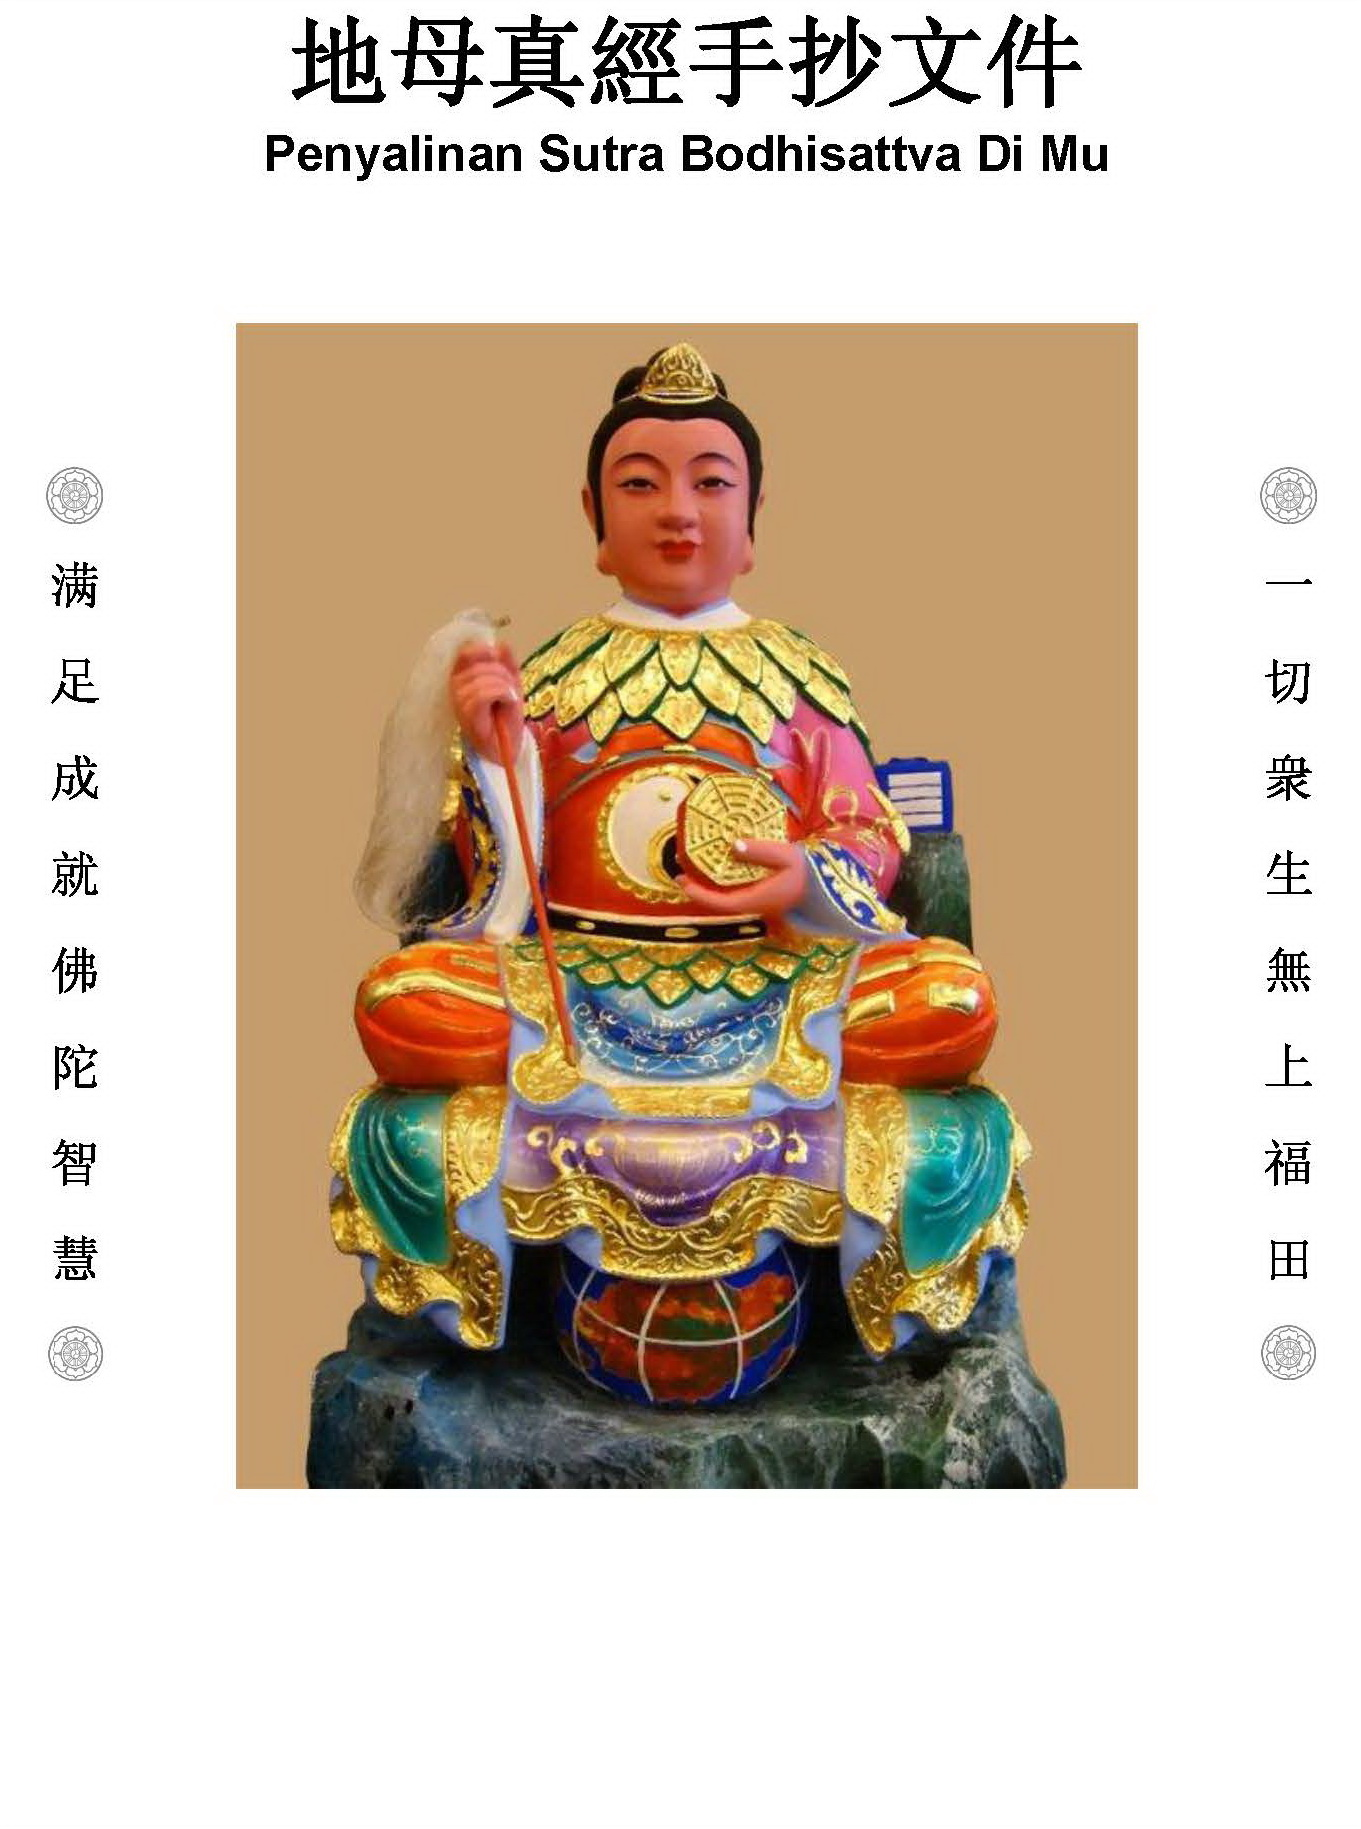 Penyalinan Sutra Bodhisattva Di Mu